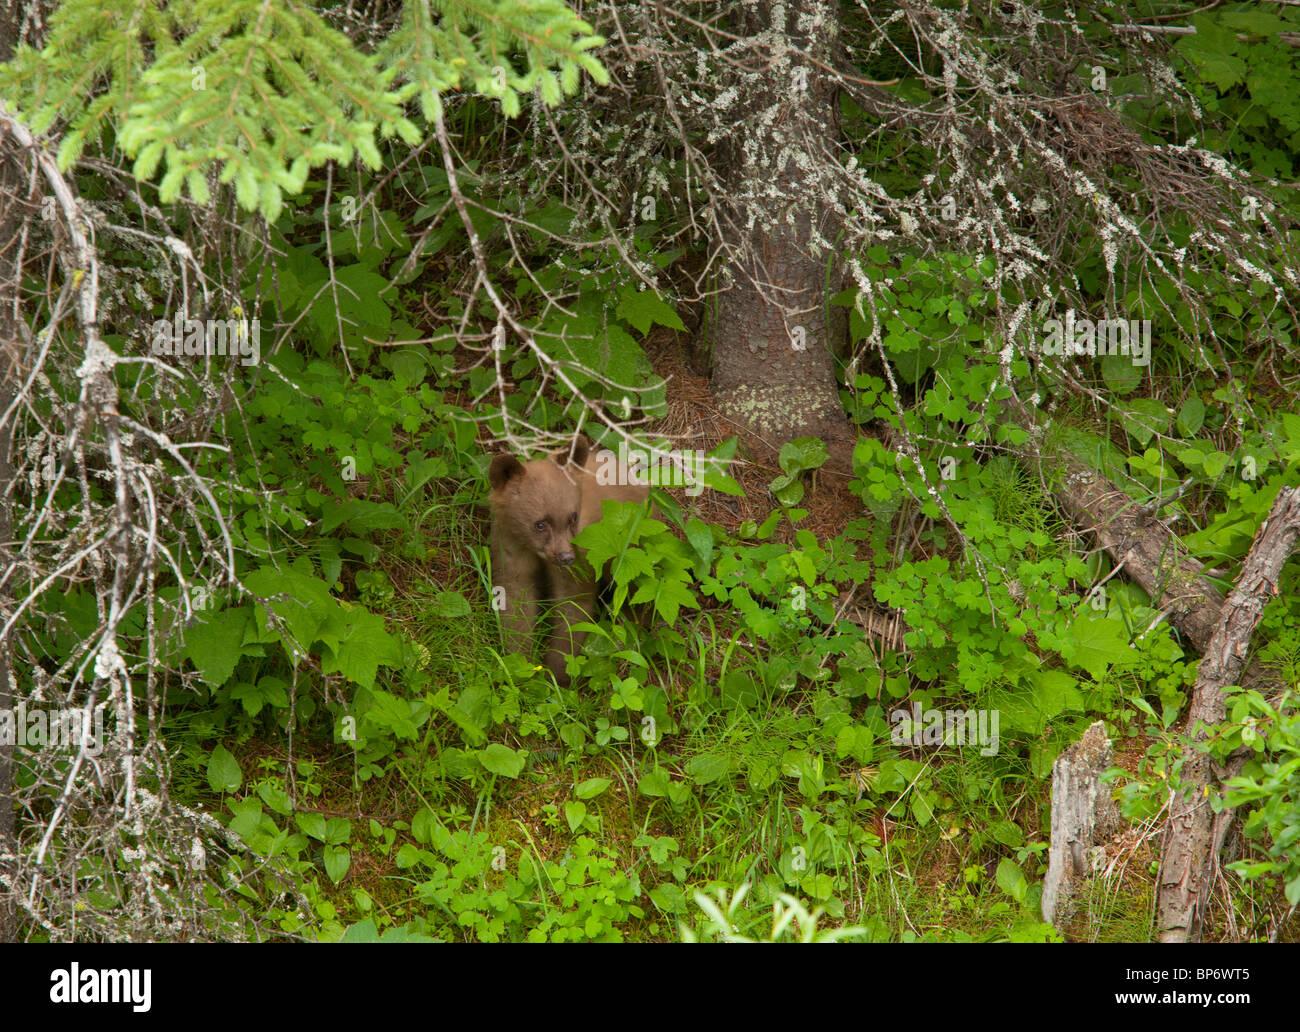 Grizzly Bear, Ursus arctos horribilis, cub in woodland; Waterton NP, Rockies, Canada - Stock Image